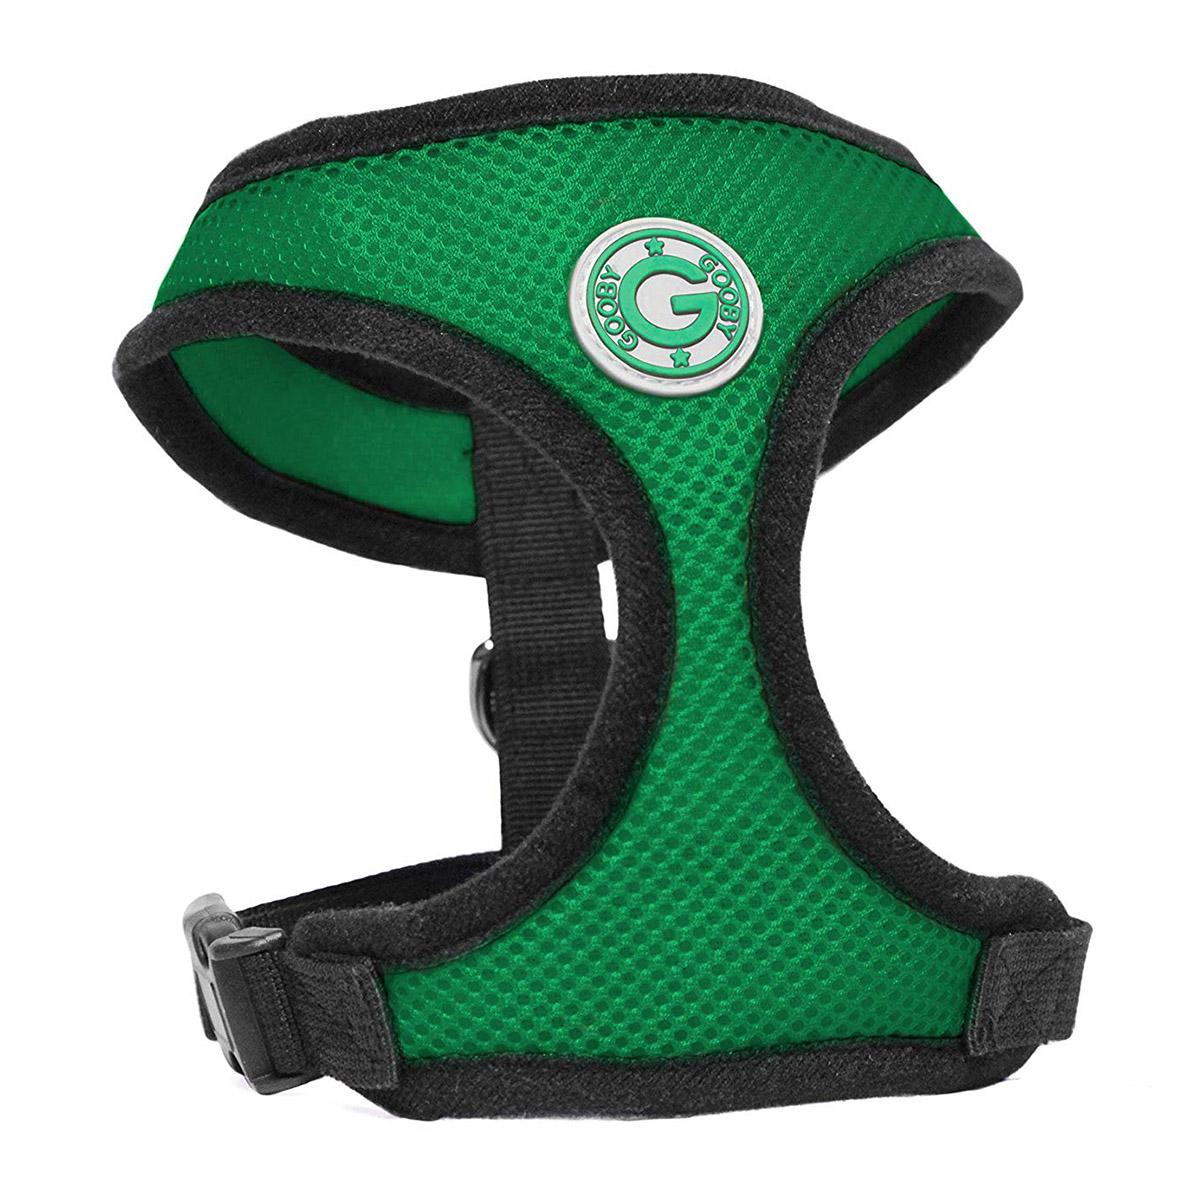 Gooby Soft Mesh Dog Harness - Hunter Green